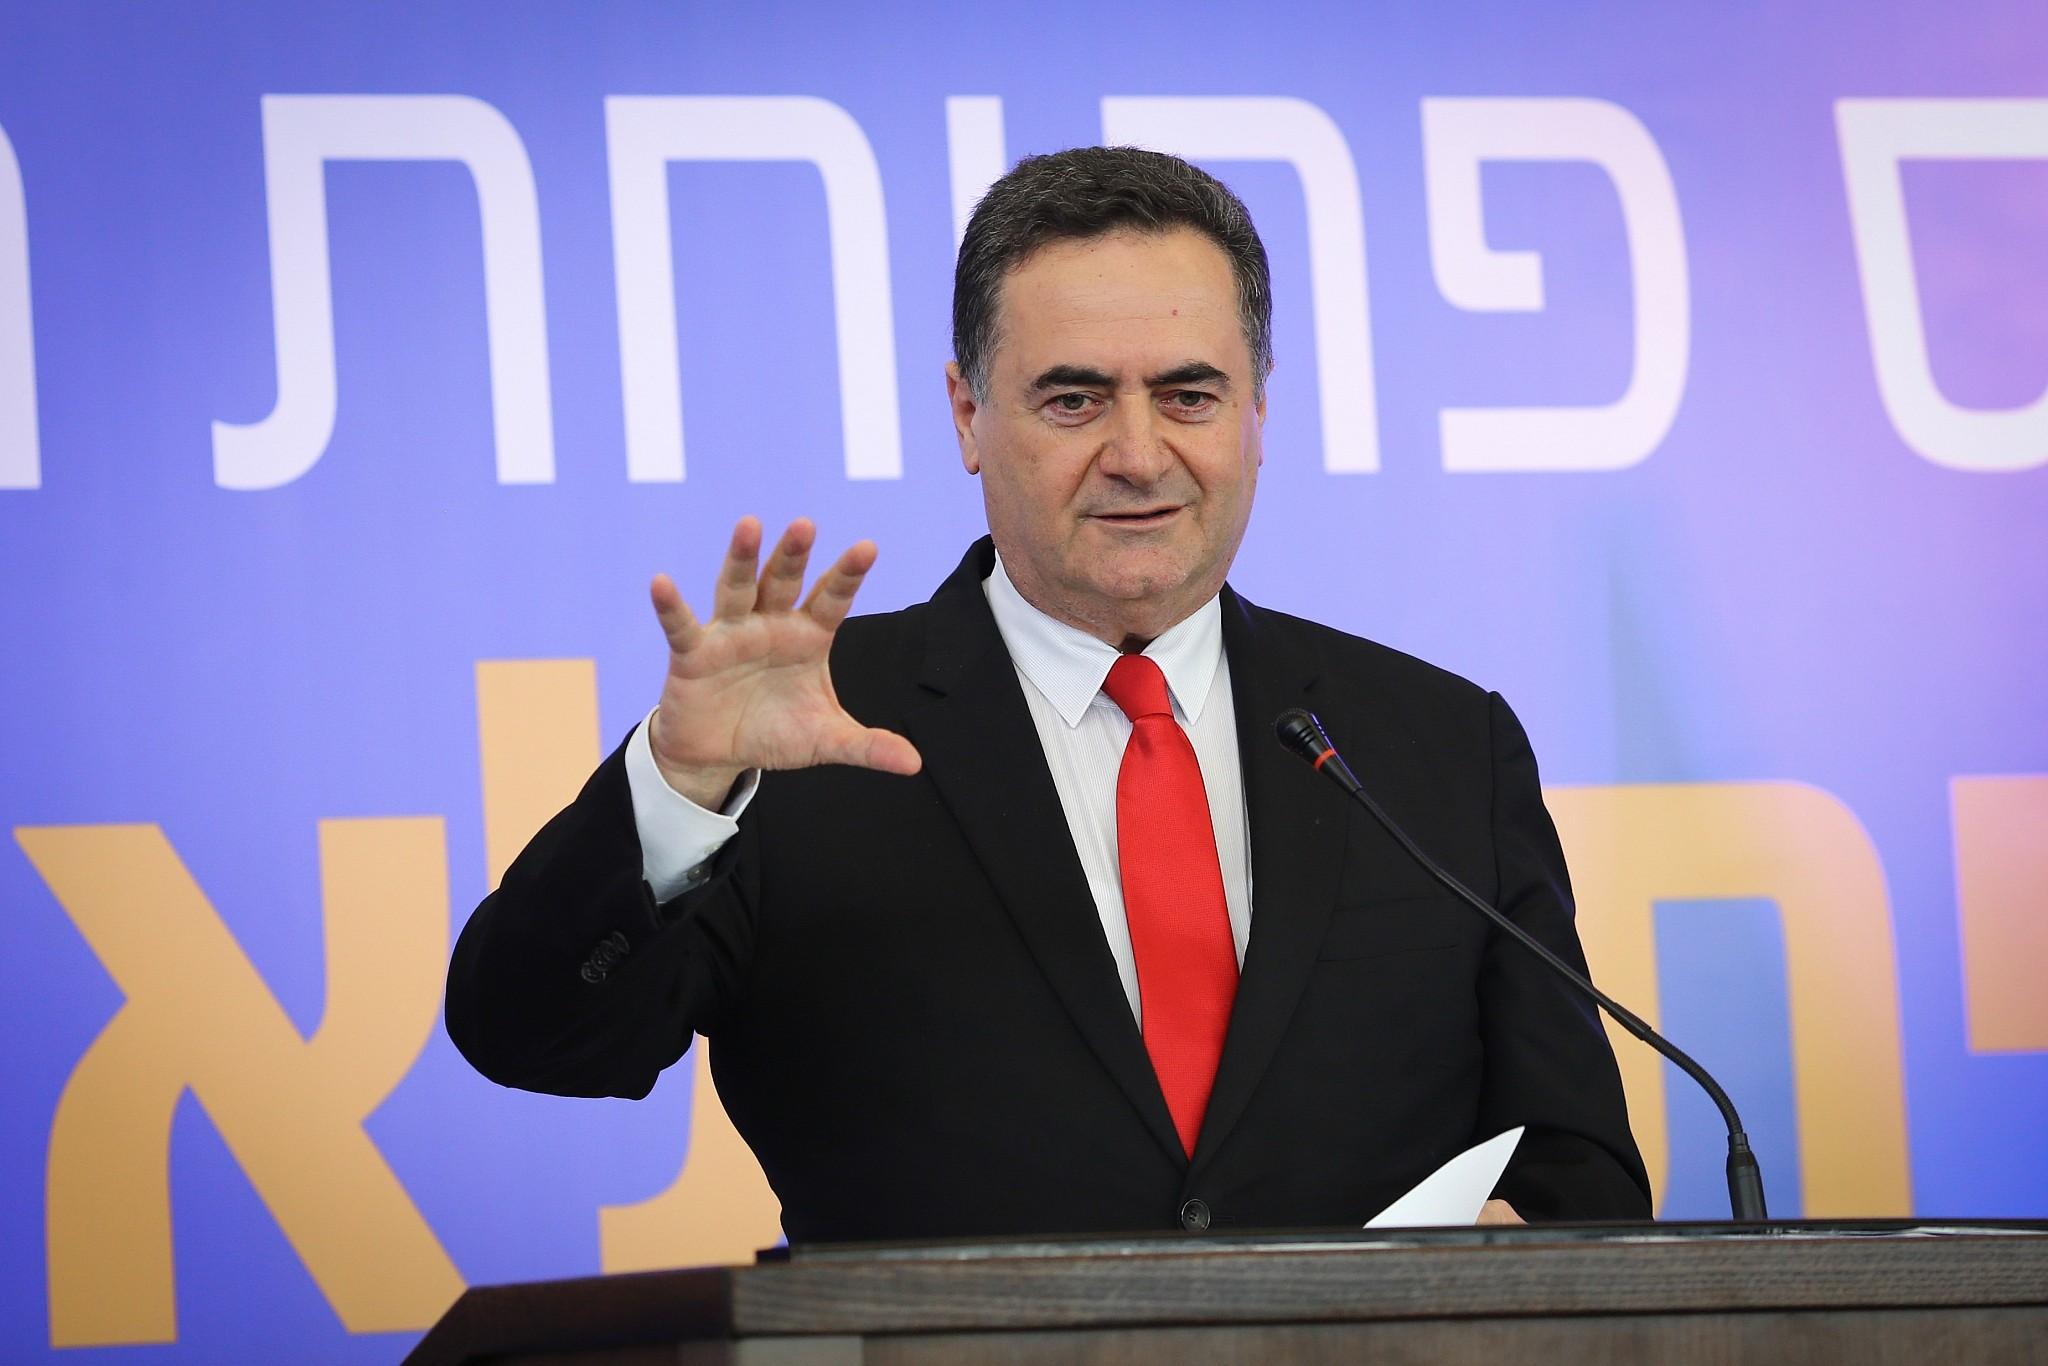 Netanyahou met en garde contre le transfert d'armes sophistiquées en Syrie — Russie